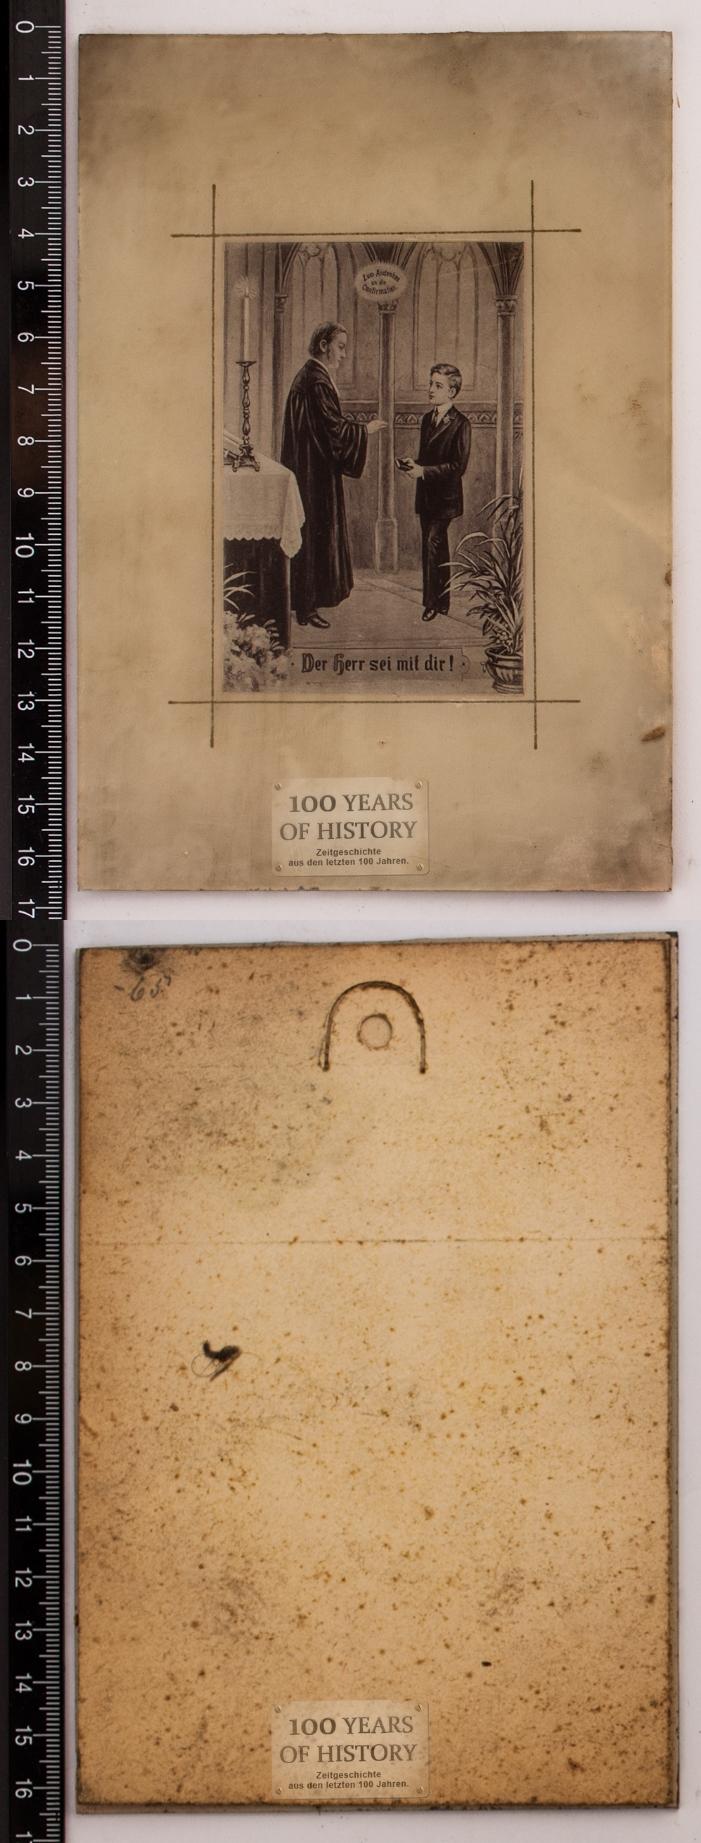 orig foto hinter glas ca 1900 bis 1910 pfarrer kirche spr che gott herr uvm ebay. Black Bedroom Furniture Sets. Home Design Ideas